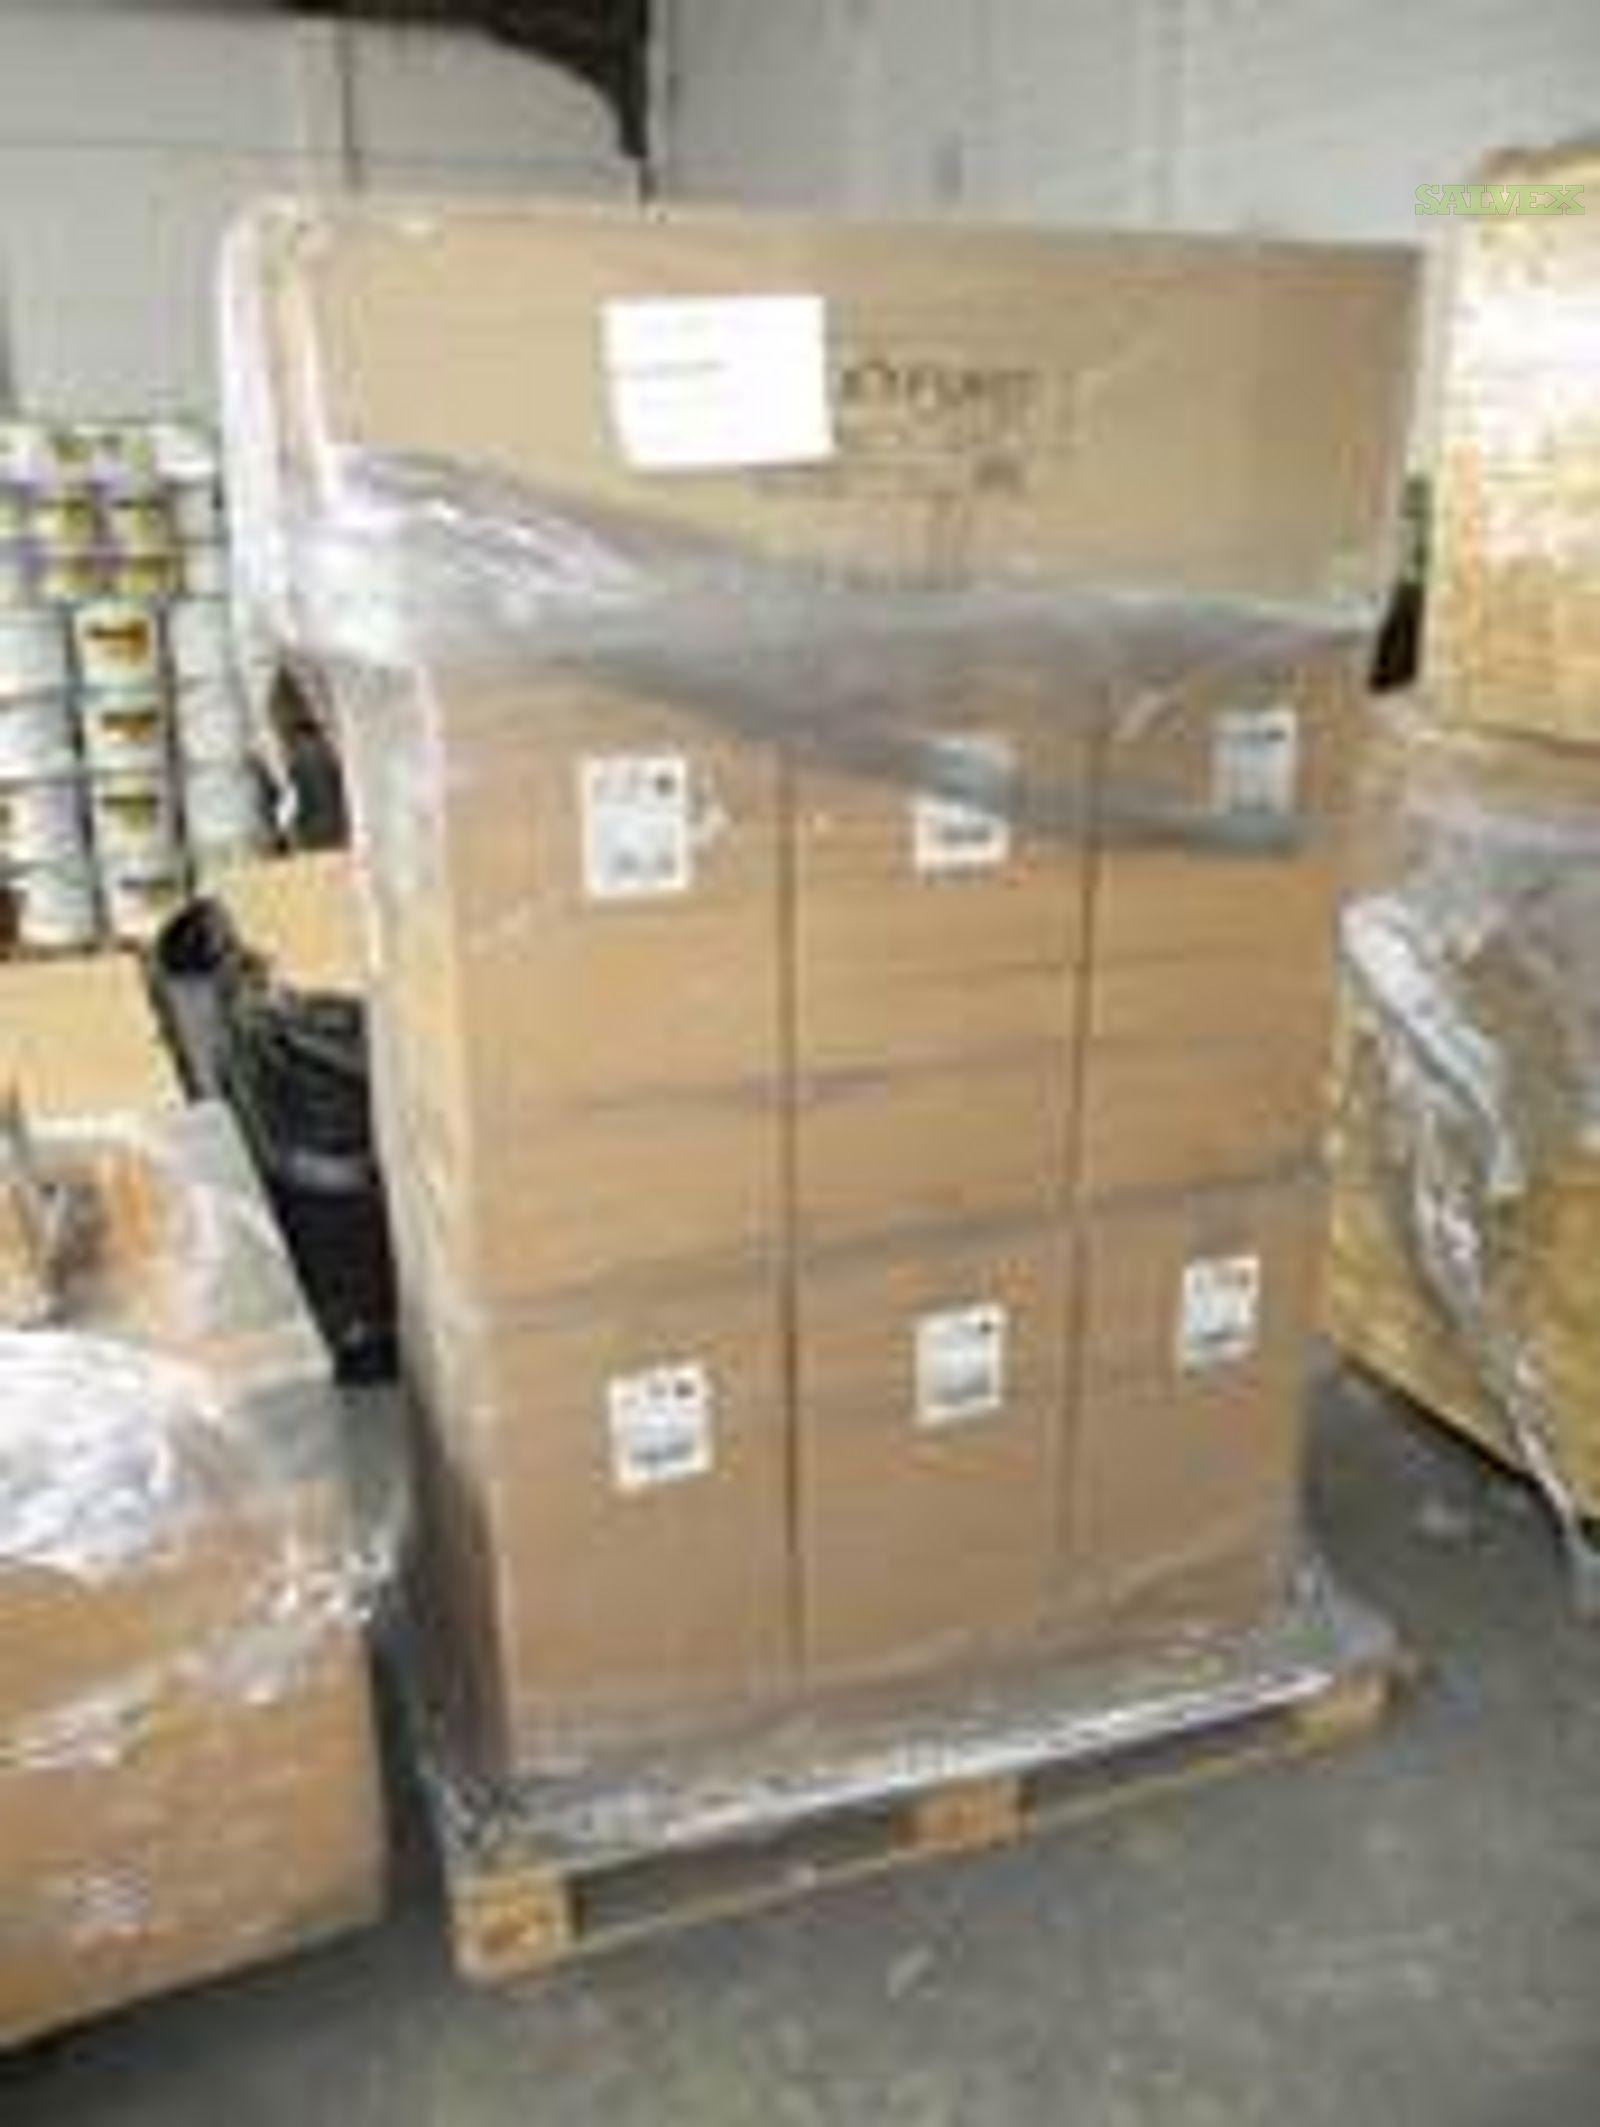 Medical Operating Equipment (2.053 kgs)